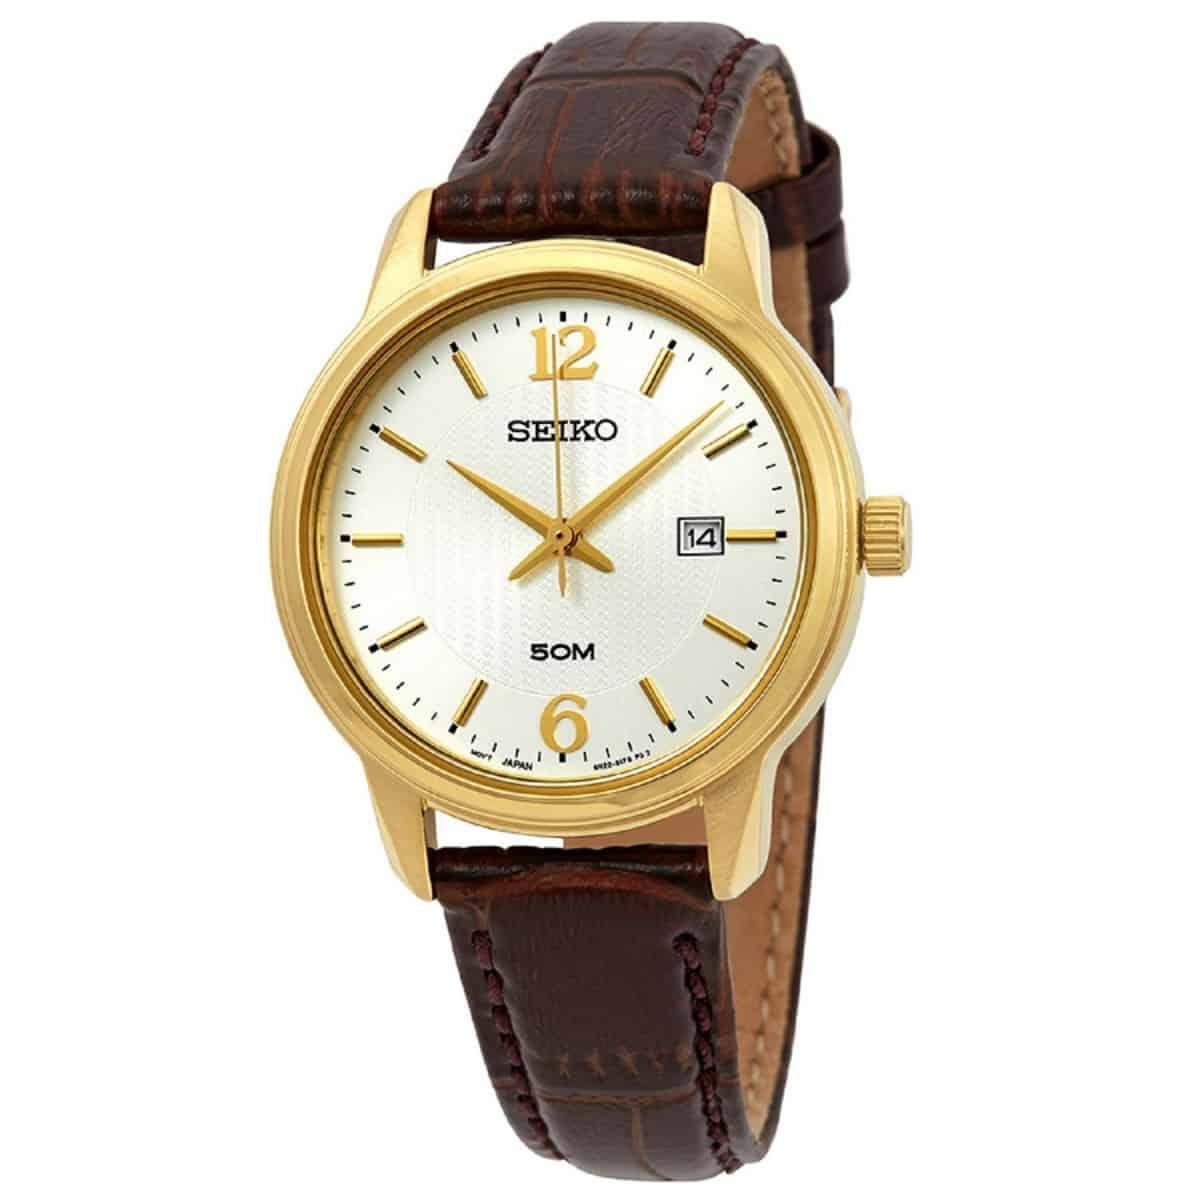 02b86950f85e Reloj Time Force de cuarzo para hombre